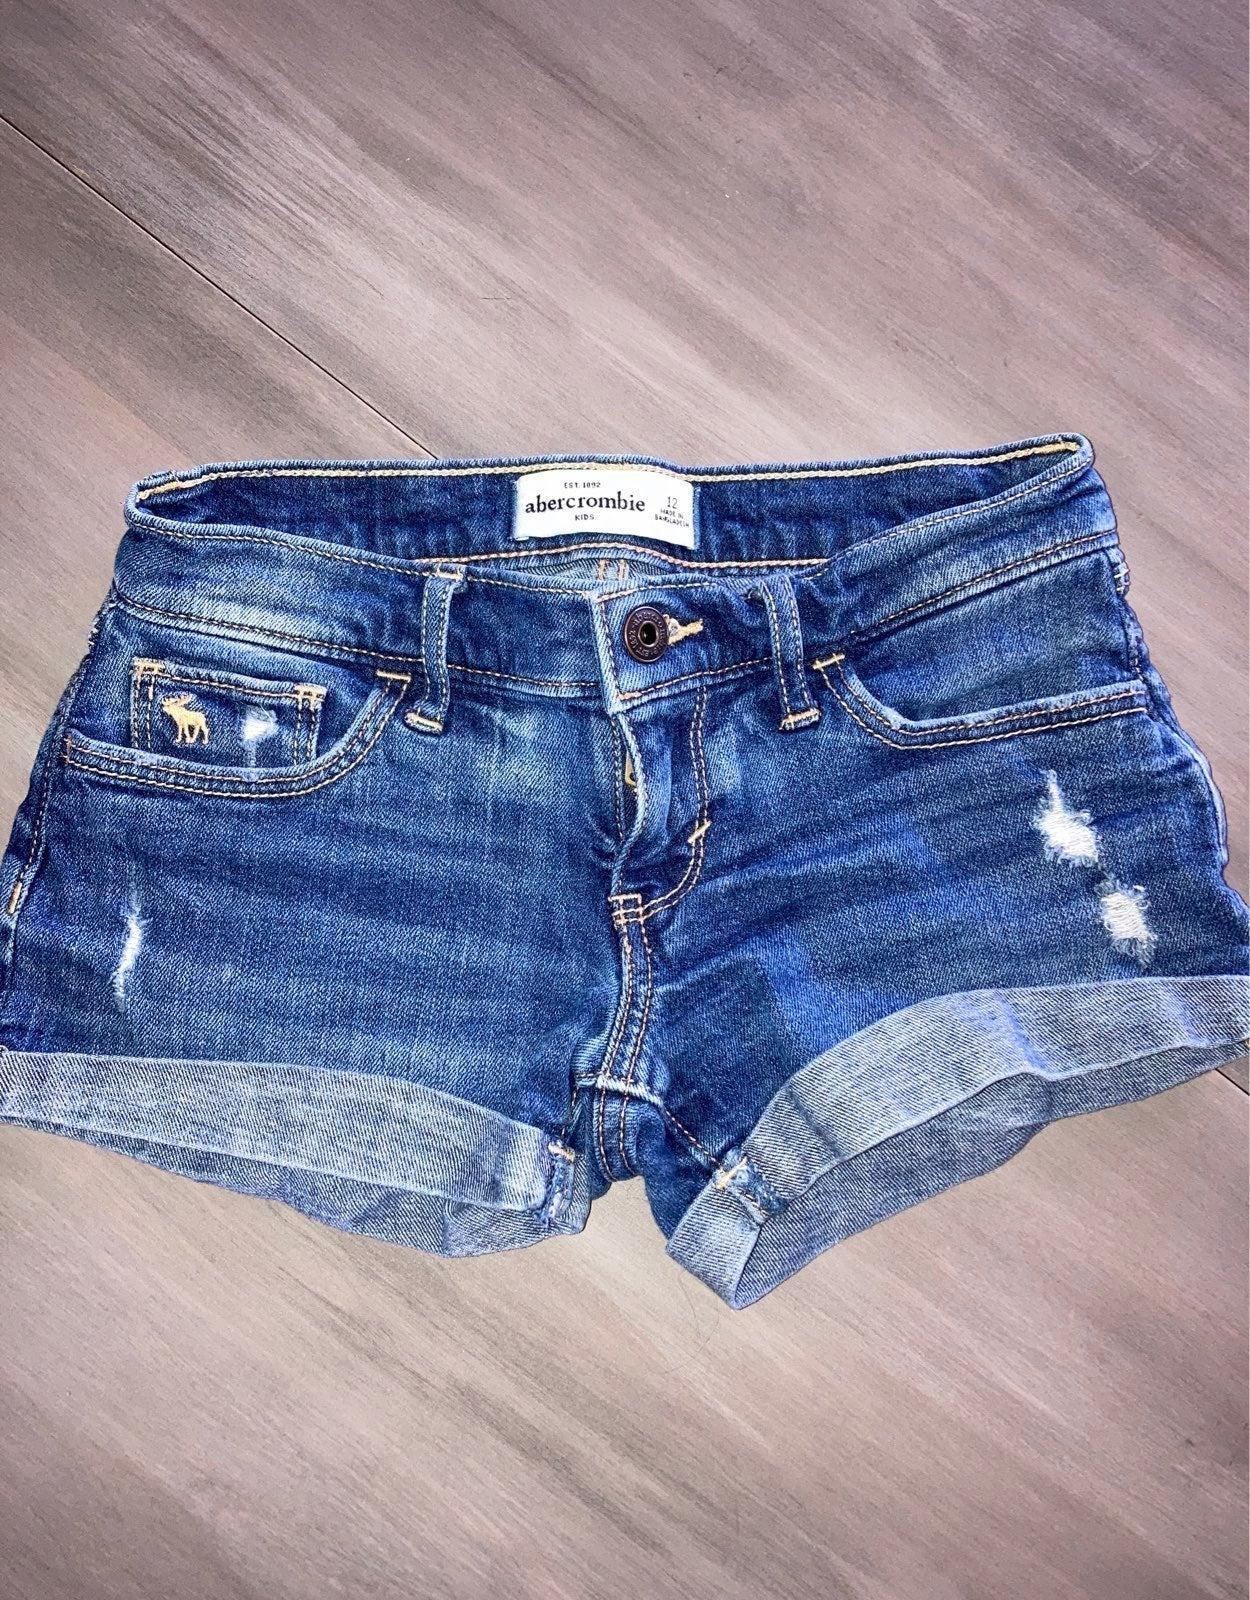 Abercrombie Jean Shorts